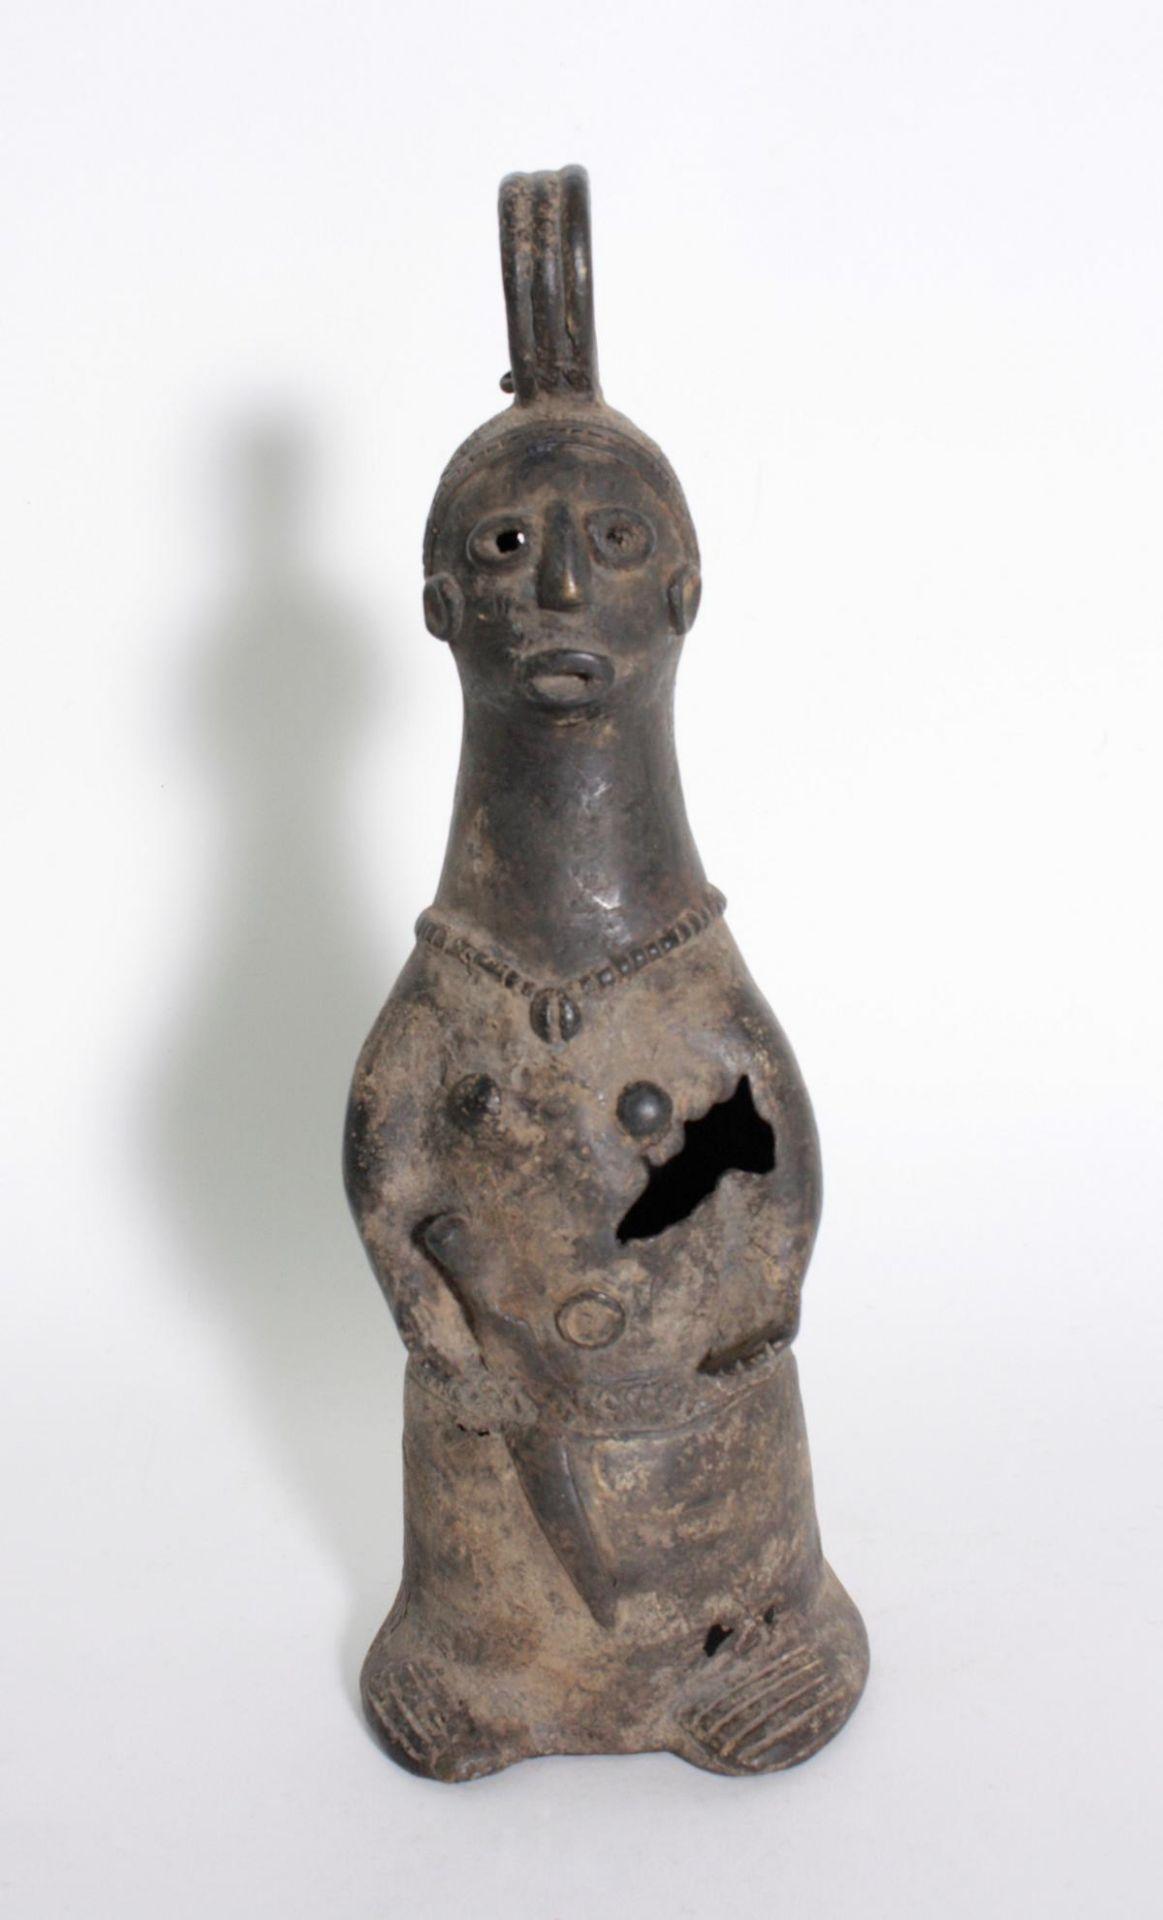 Bronze-Doppelkopf-Glocke, Benin, Nigeria, 1. Hälfte 20. Jh.